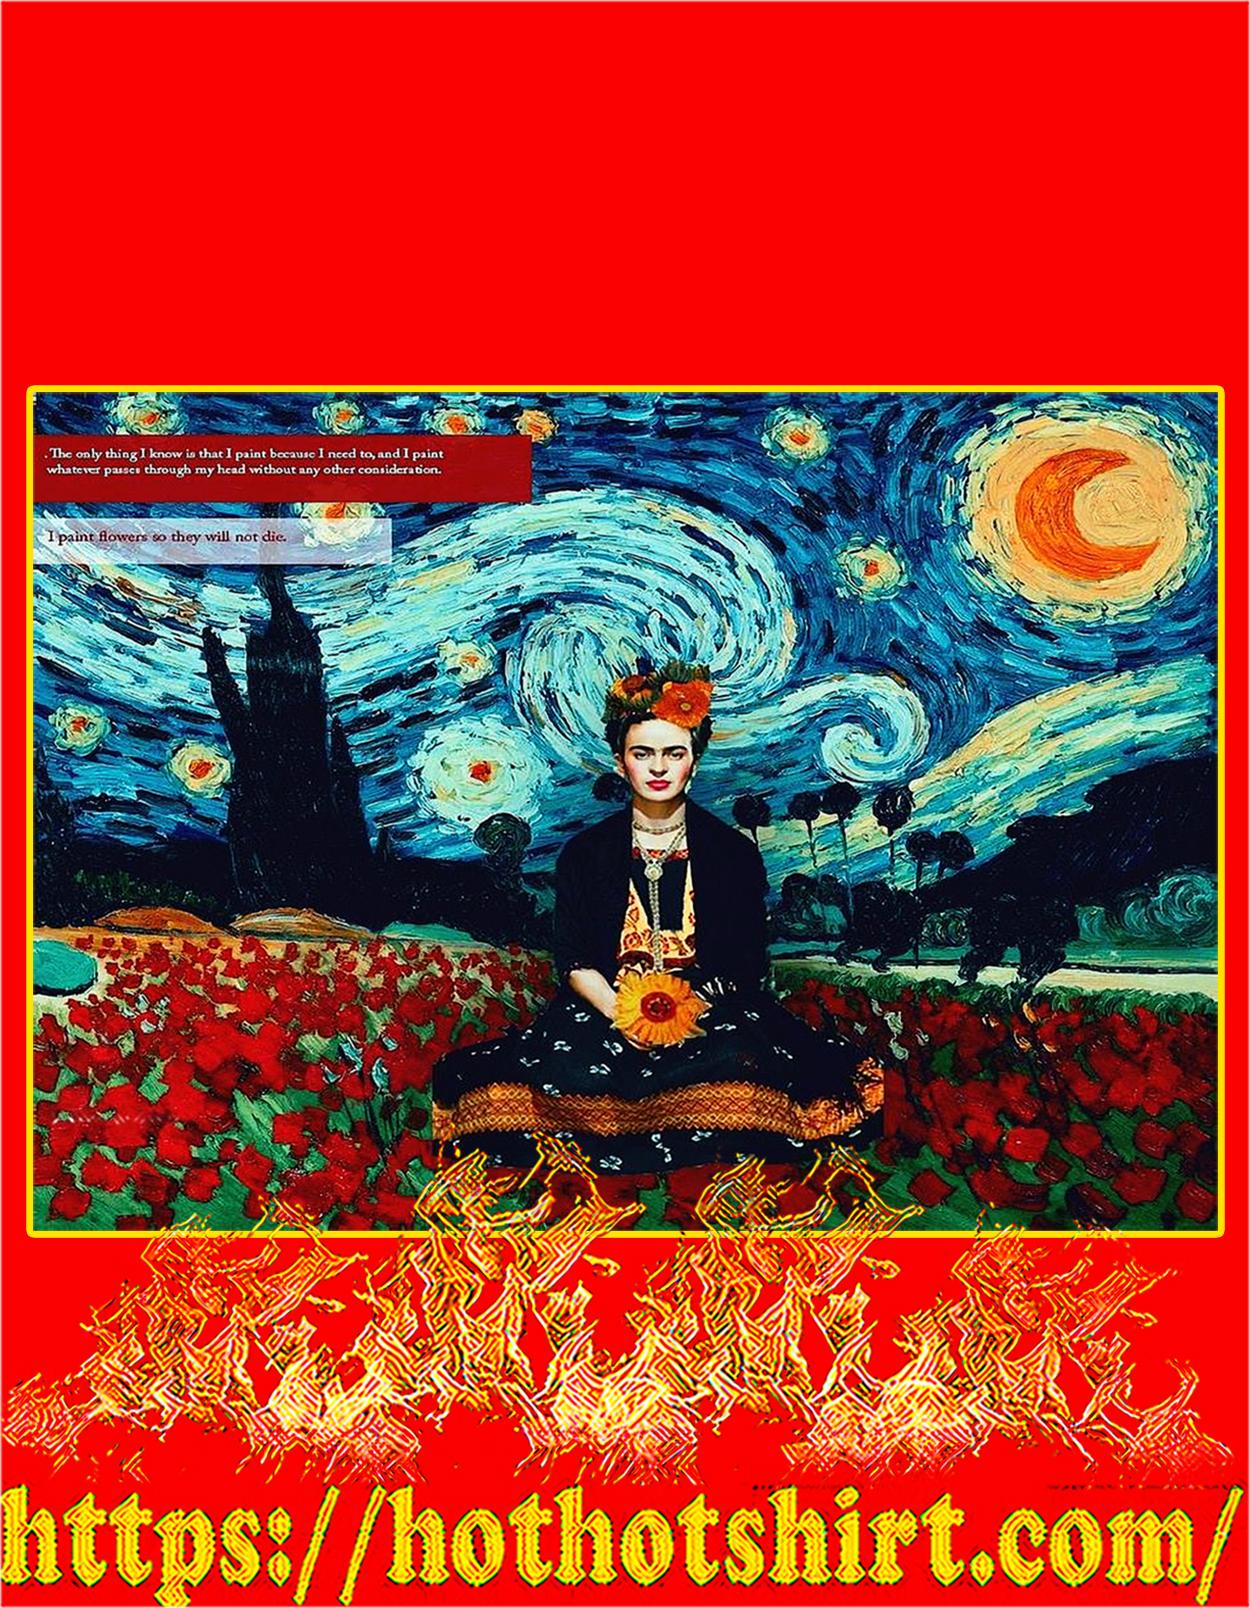 Frida kahlo flower starry night poster - A3